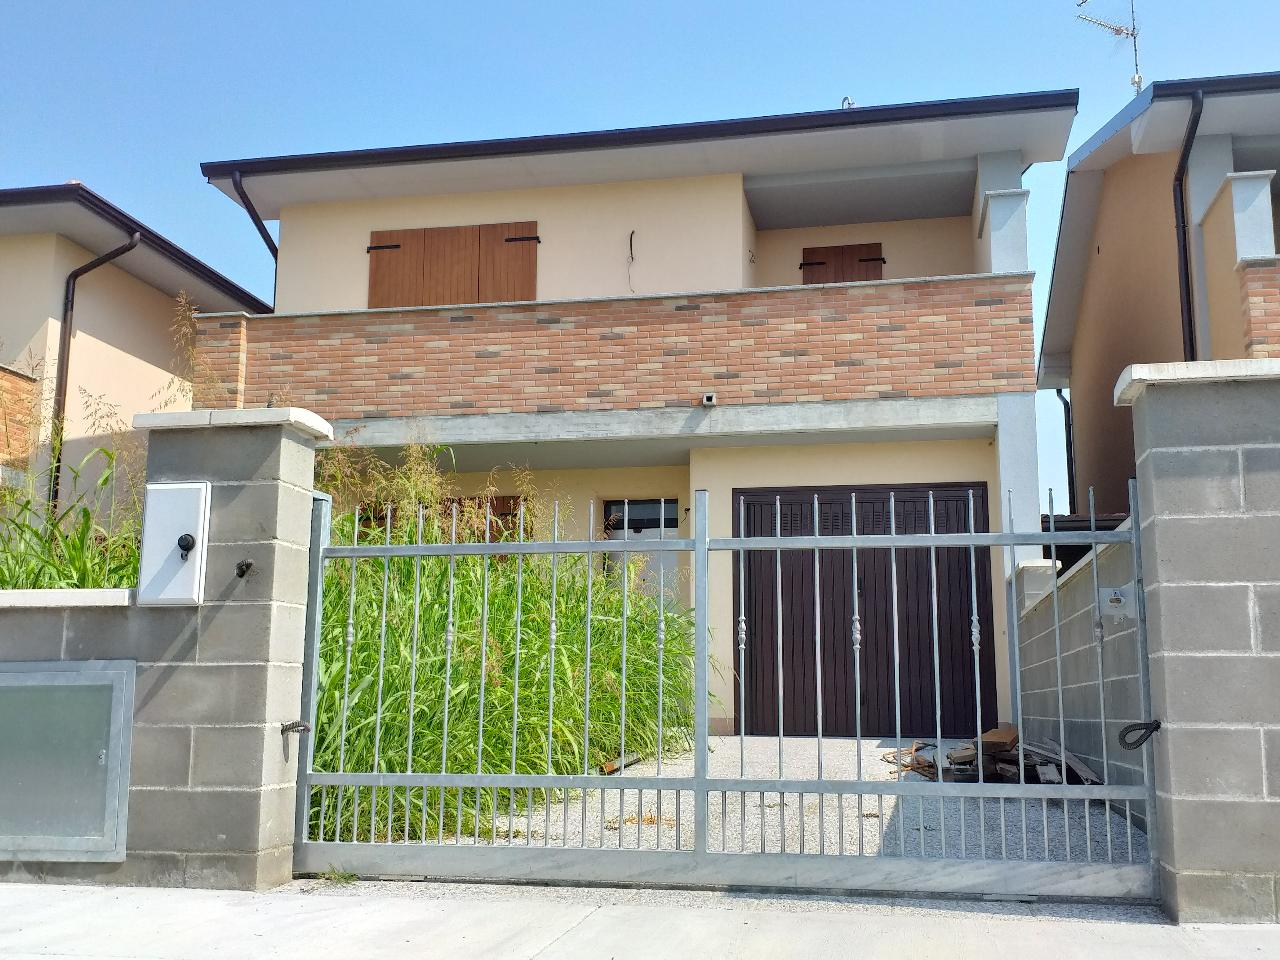 Villa a schiera PIEVE D'OLMI €145.000,00